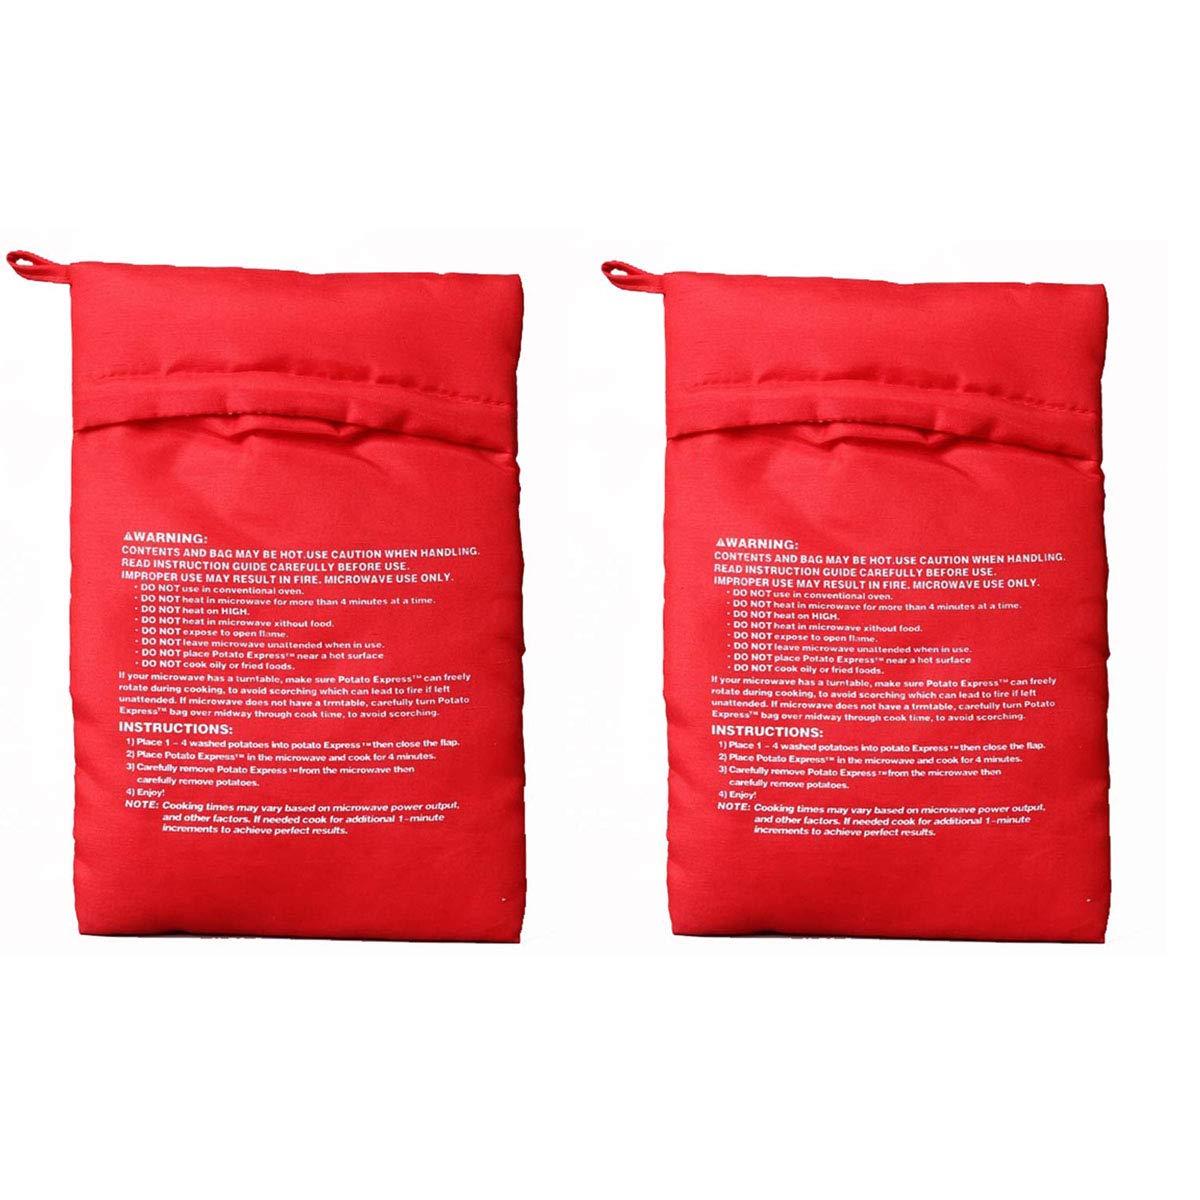 Bangbuy Microwave Potato Bag, 2 Pack of Reusable Microwave Cooker Bag Express Baked Pouch Potato Bag, Red